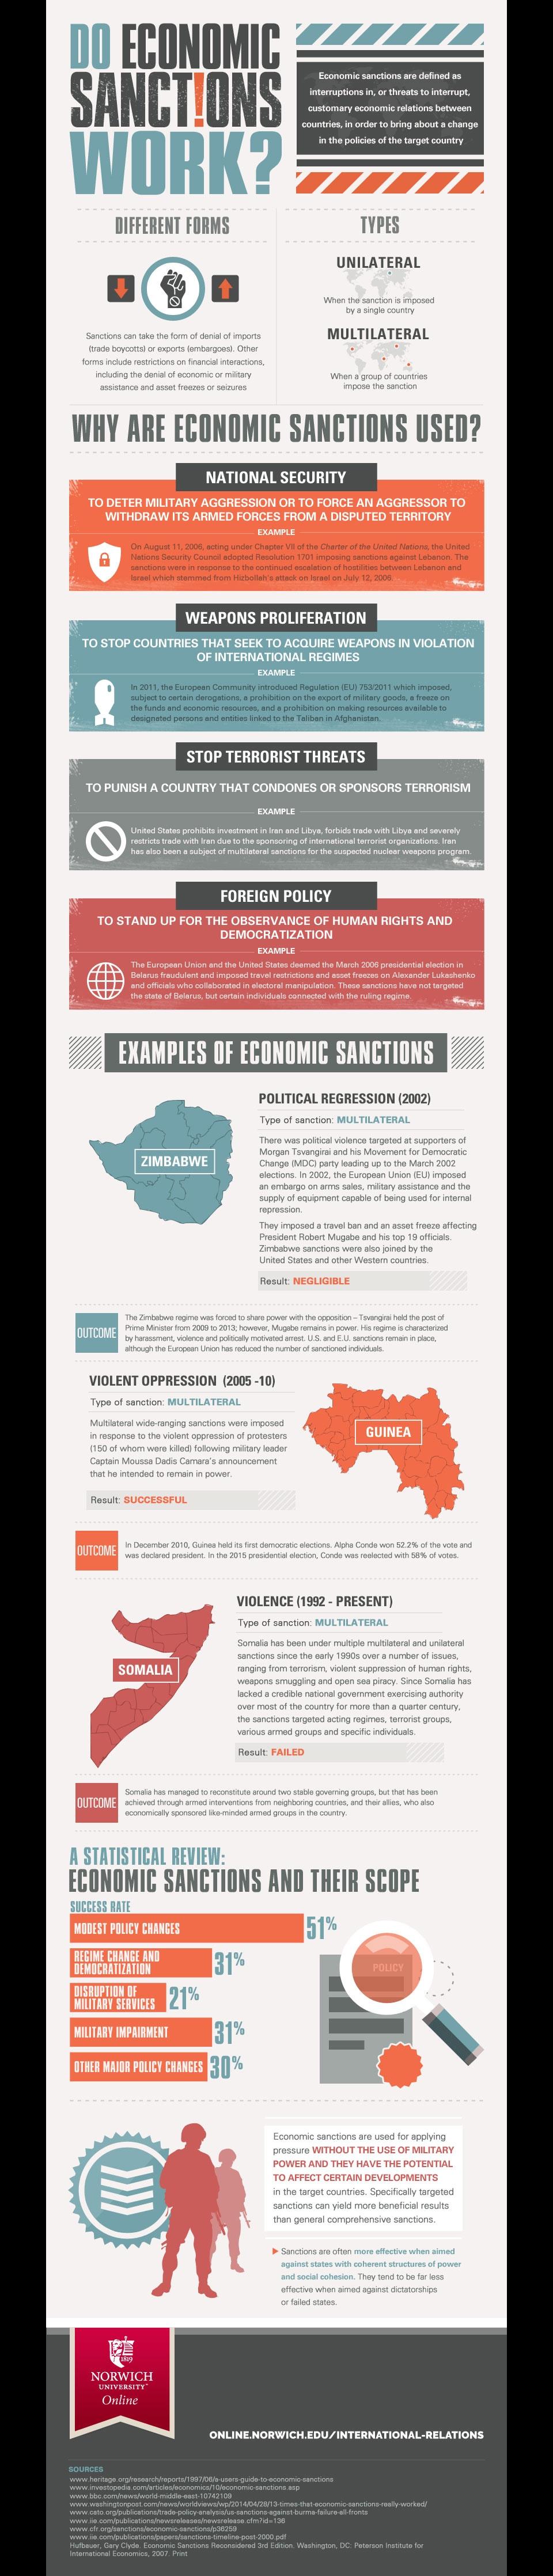 economic sanctions infographic image